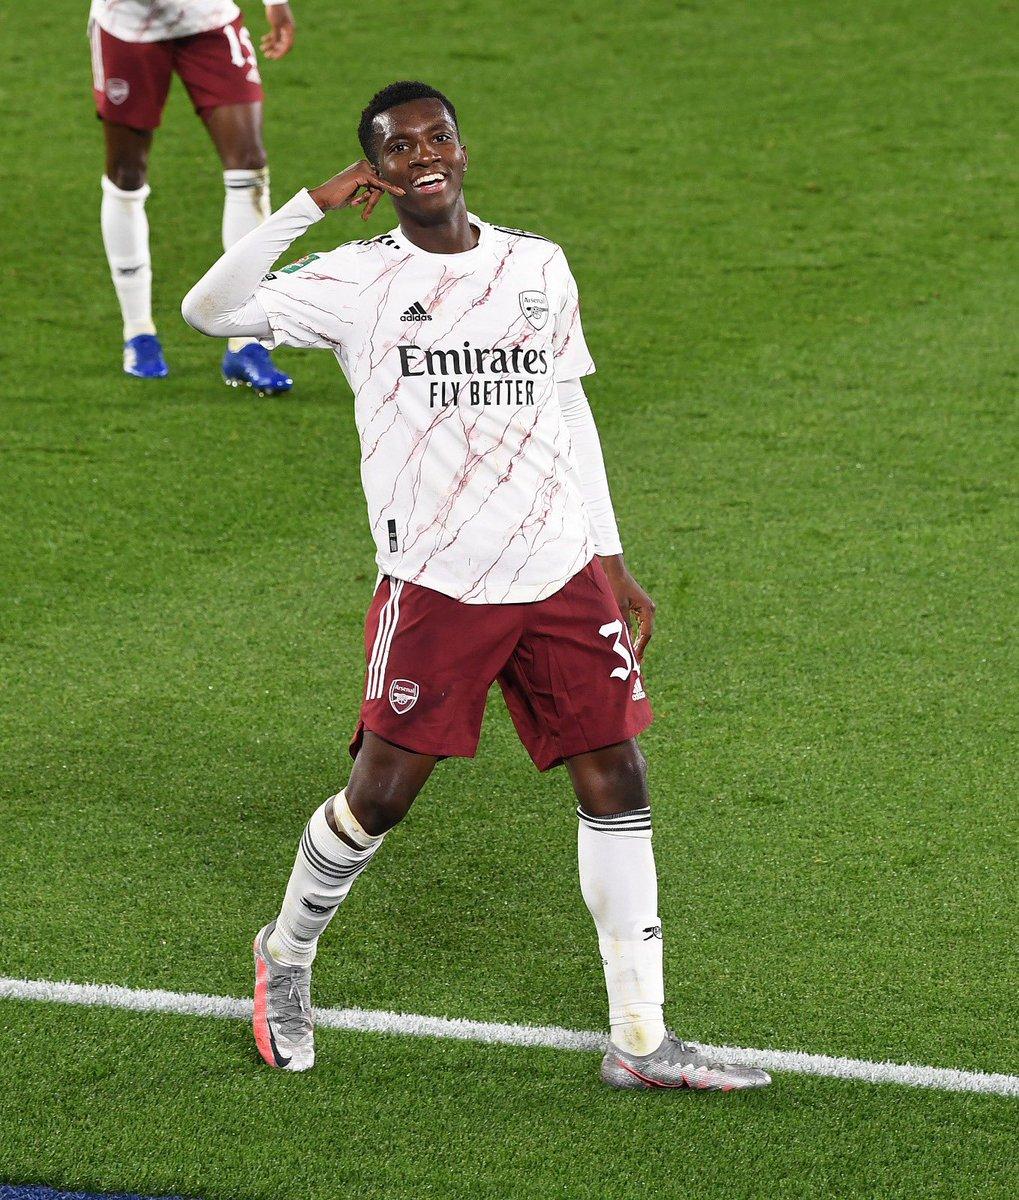 Replying to @EddieNketiah9: Into the next round - we keep pushing!  ⚽️📞 @Arsenal